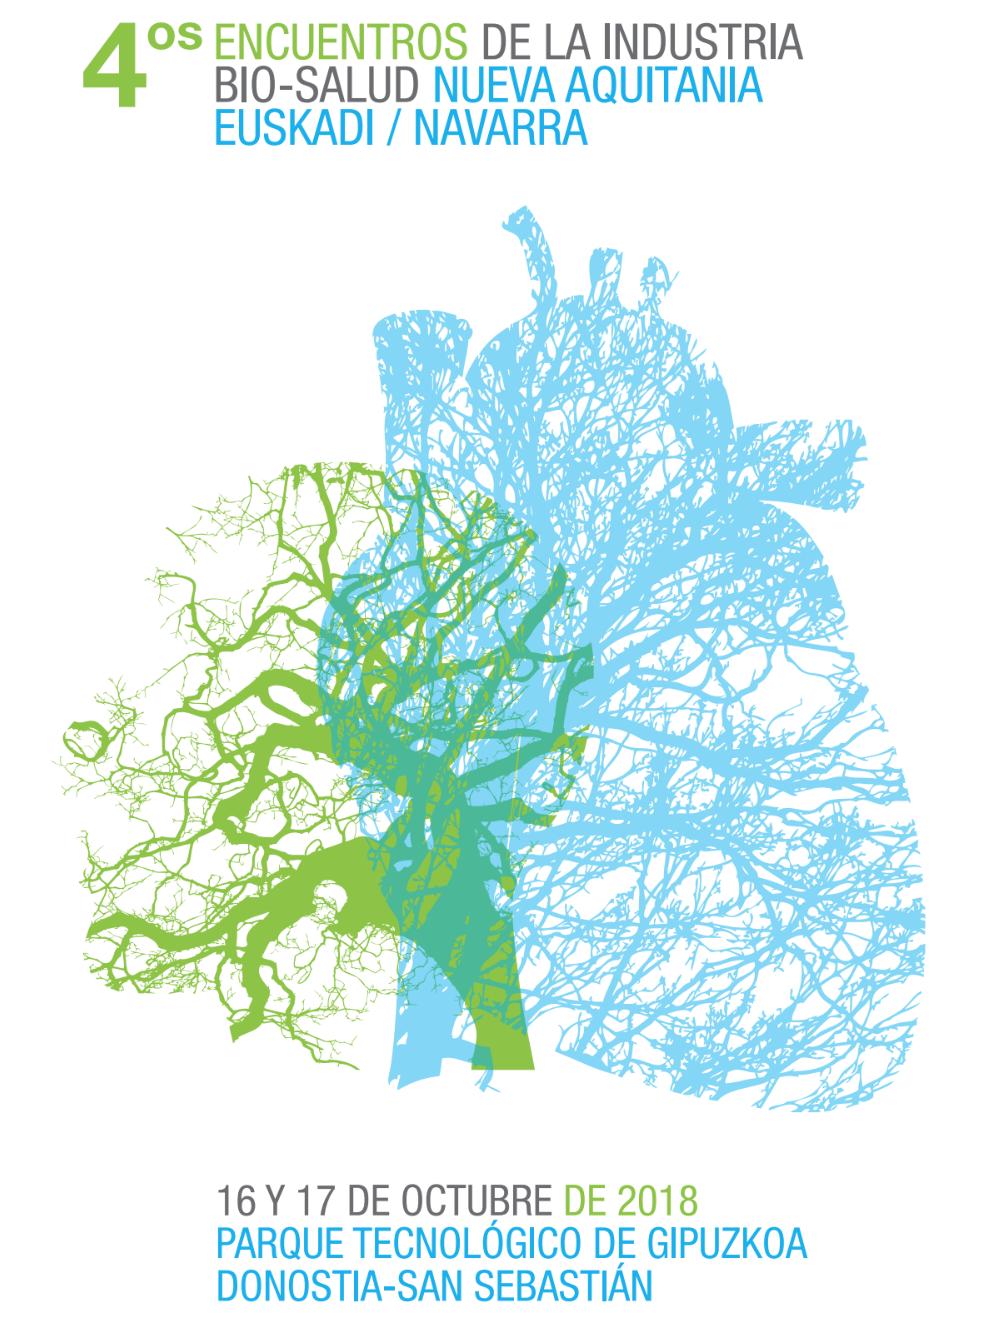 4 ° Encuentro Transfronterizo de Industrias Biosanitarias: Nueva Aquitania, País Vasco y Navarra